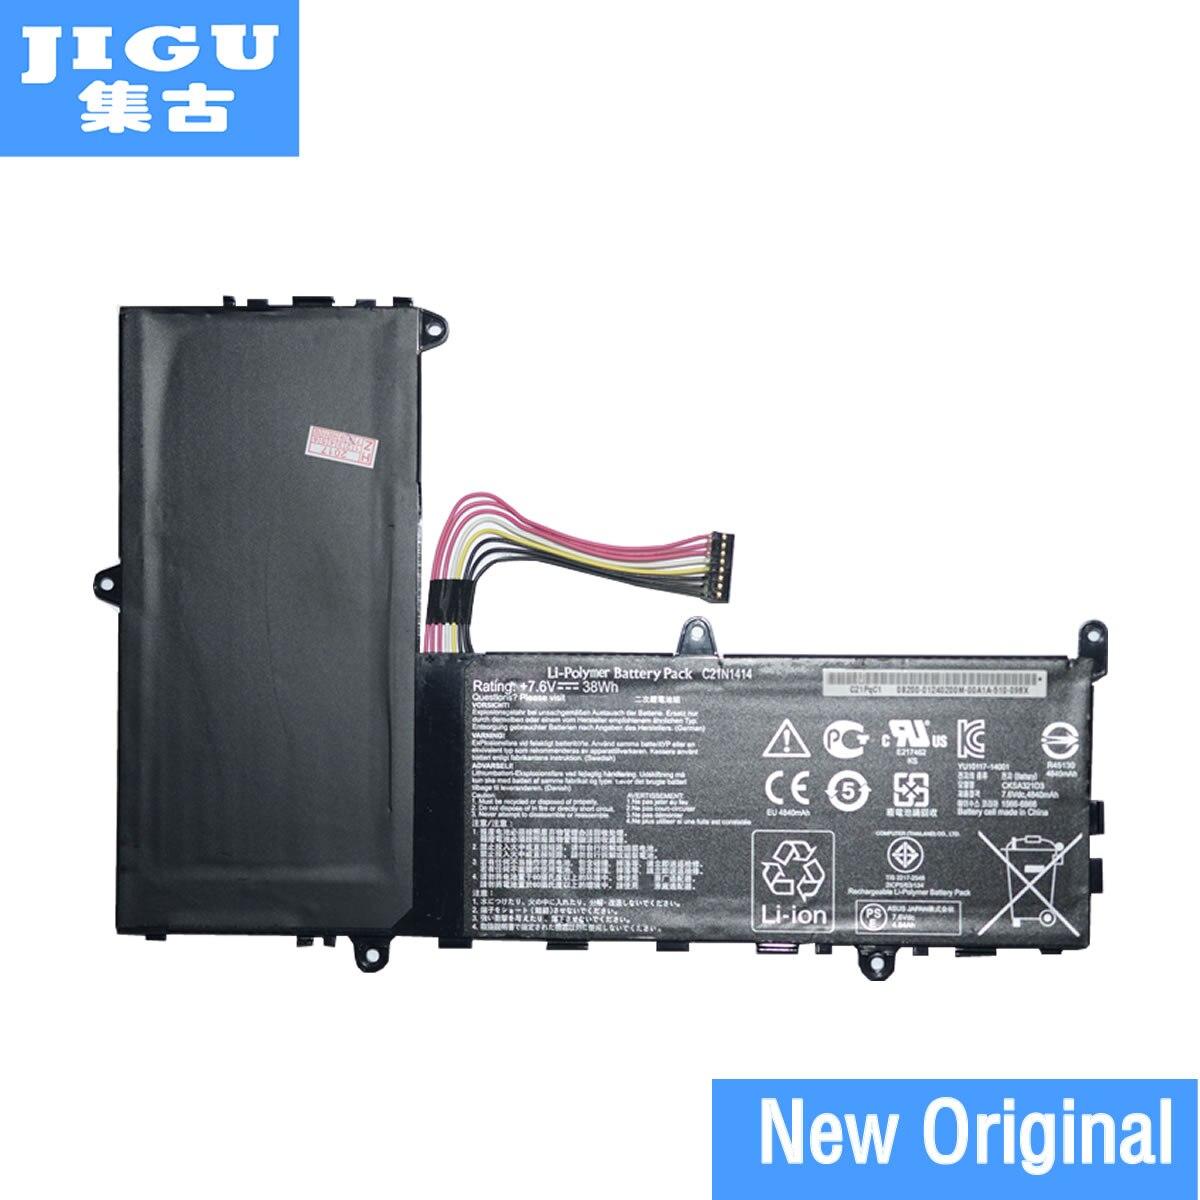 JIGU Original New C21N1414 Battery For ASUS EeeBook X205T X205TA Series C21N1414 7.6V 38WH Free 1 Year Warranty